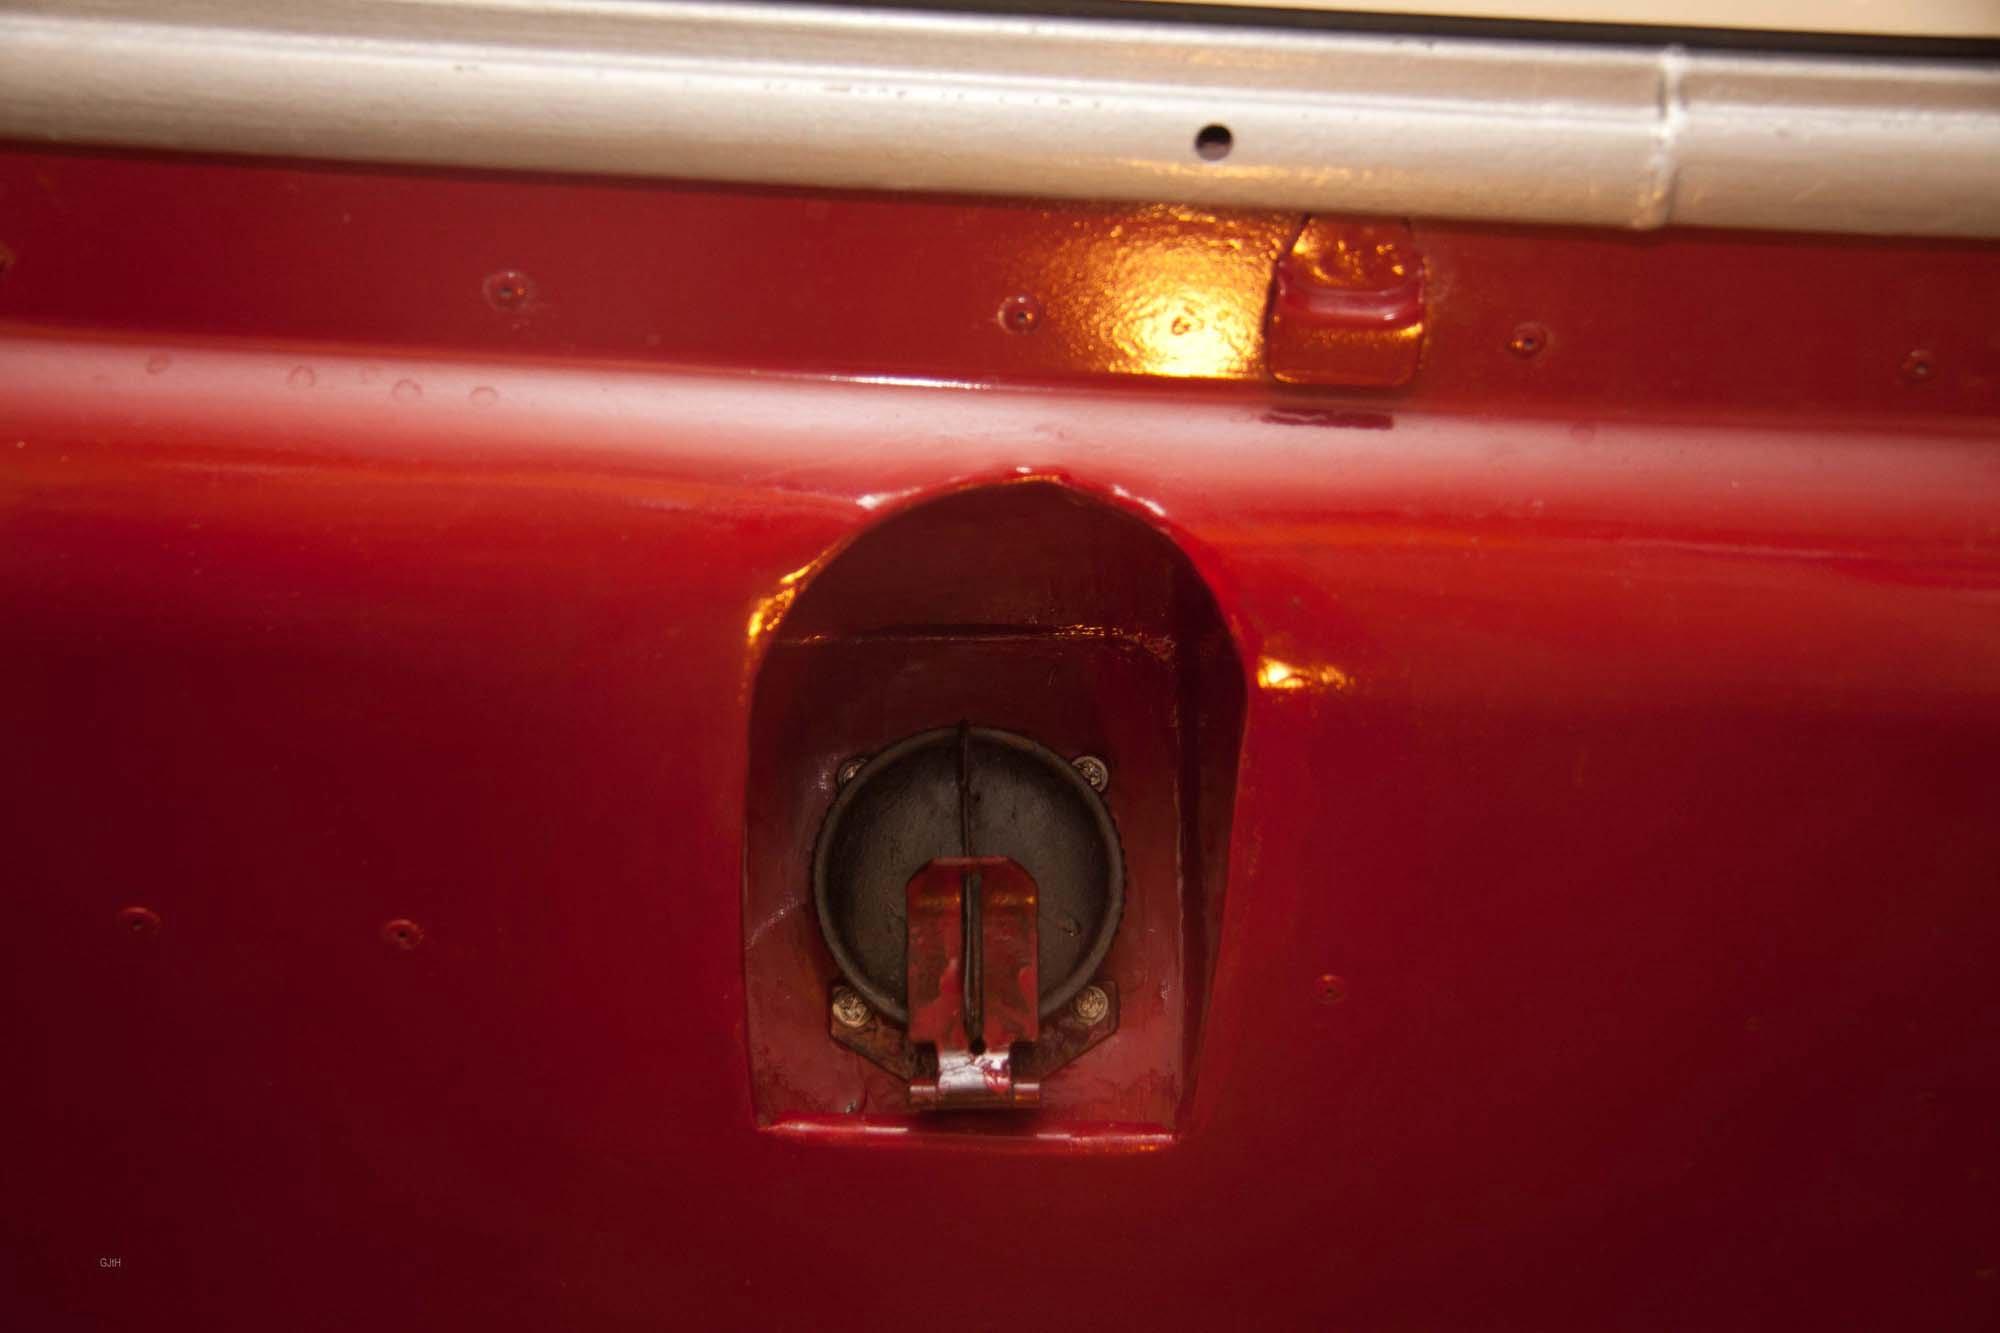 Second fuel tank (1)